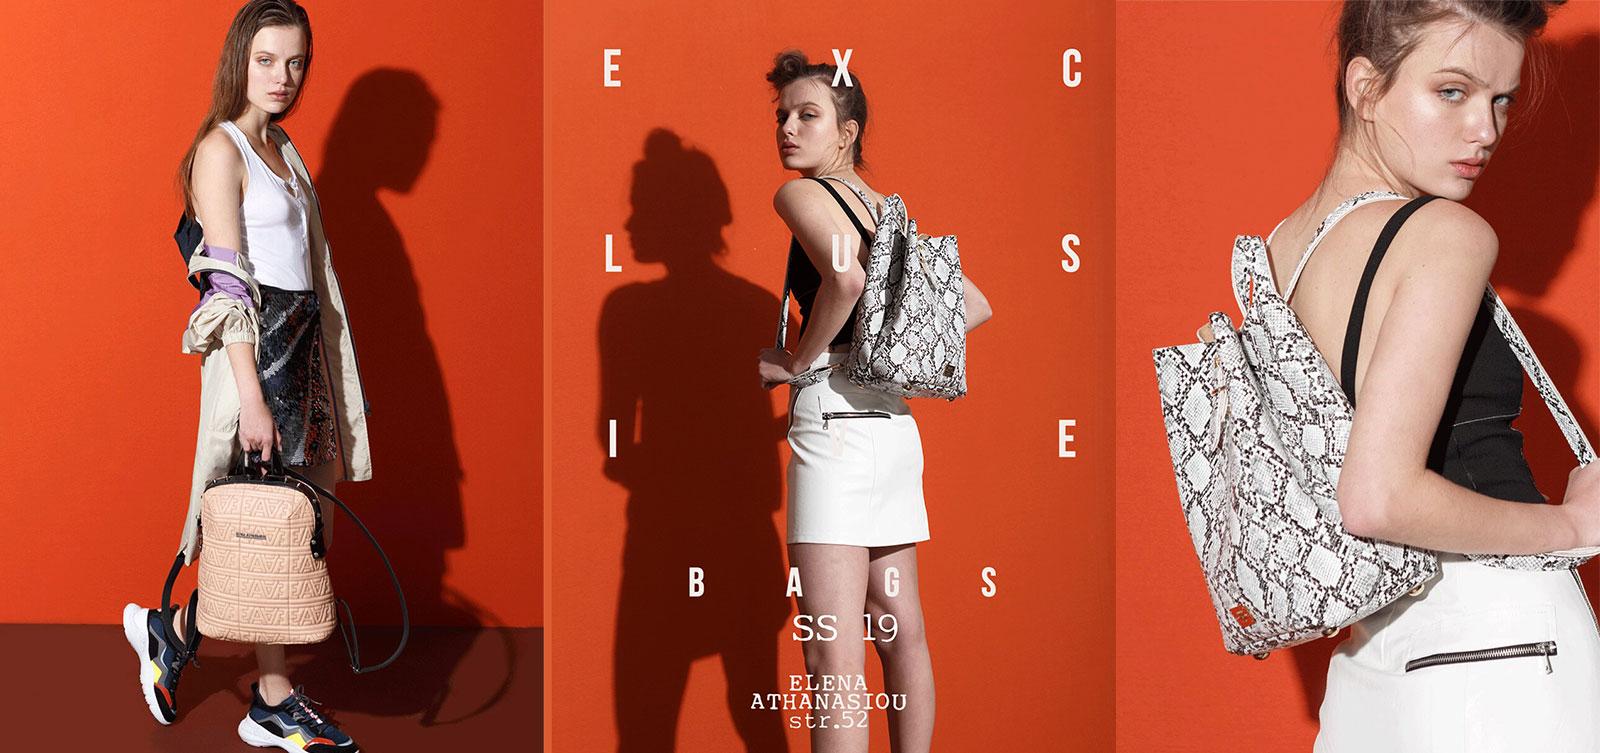 elena athanasiou bags lookbook ss19